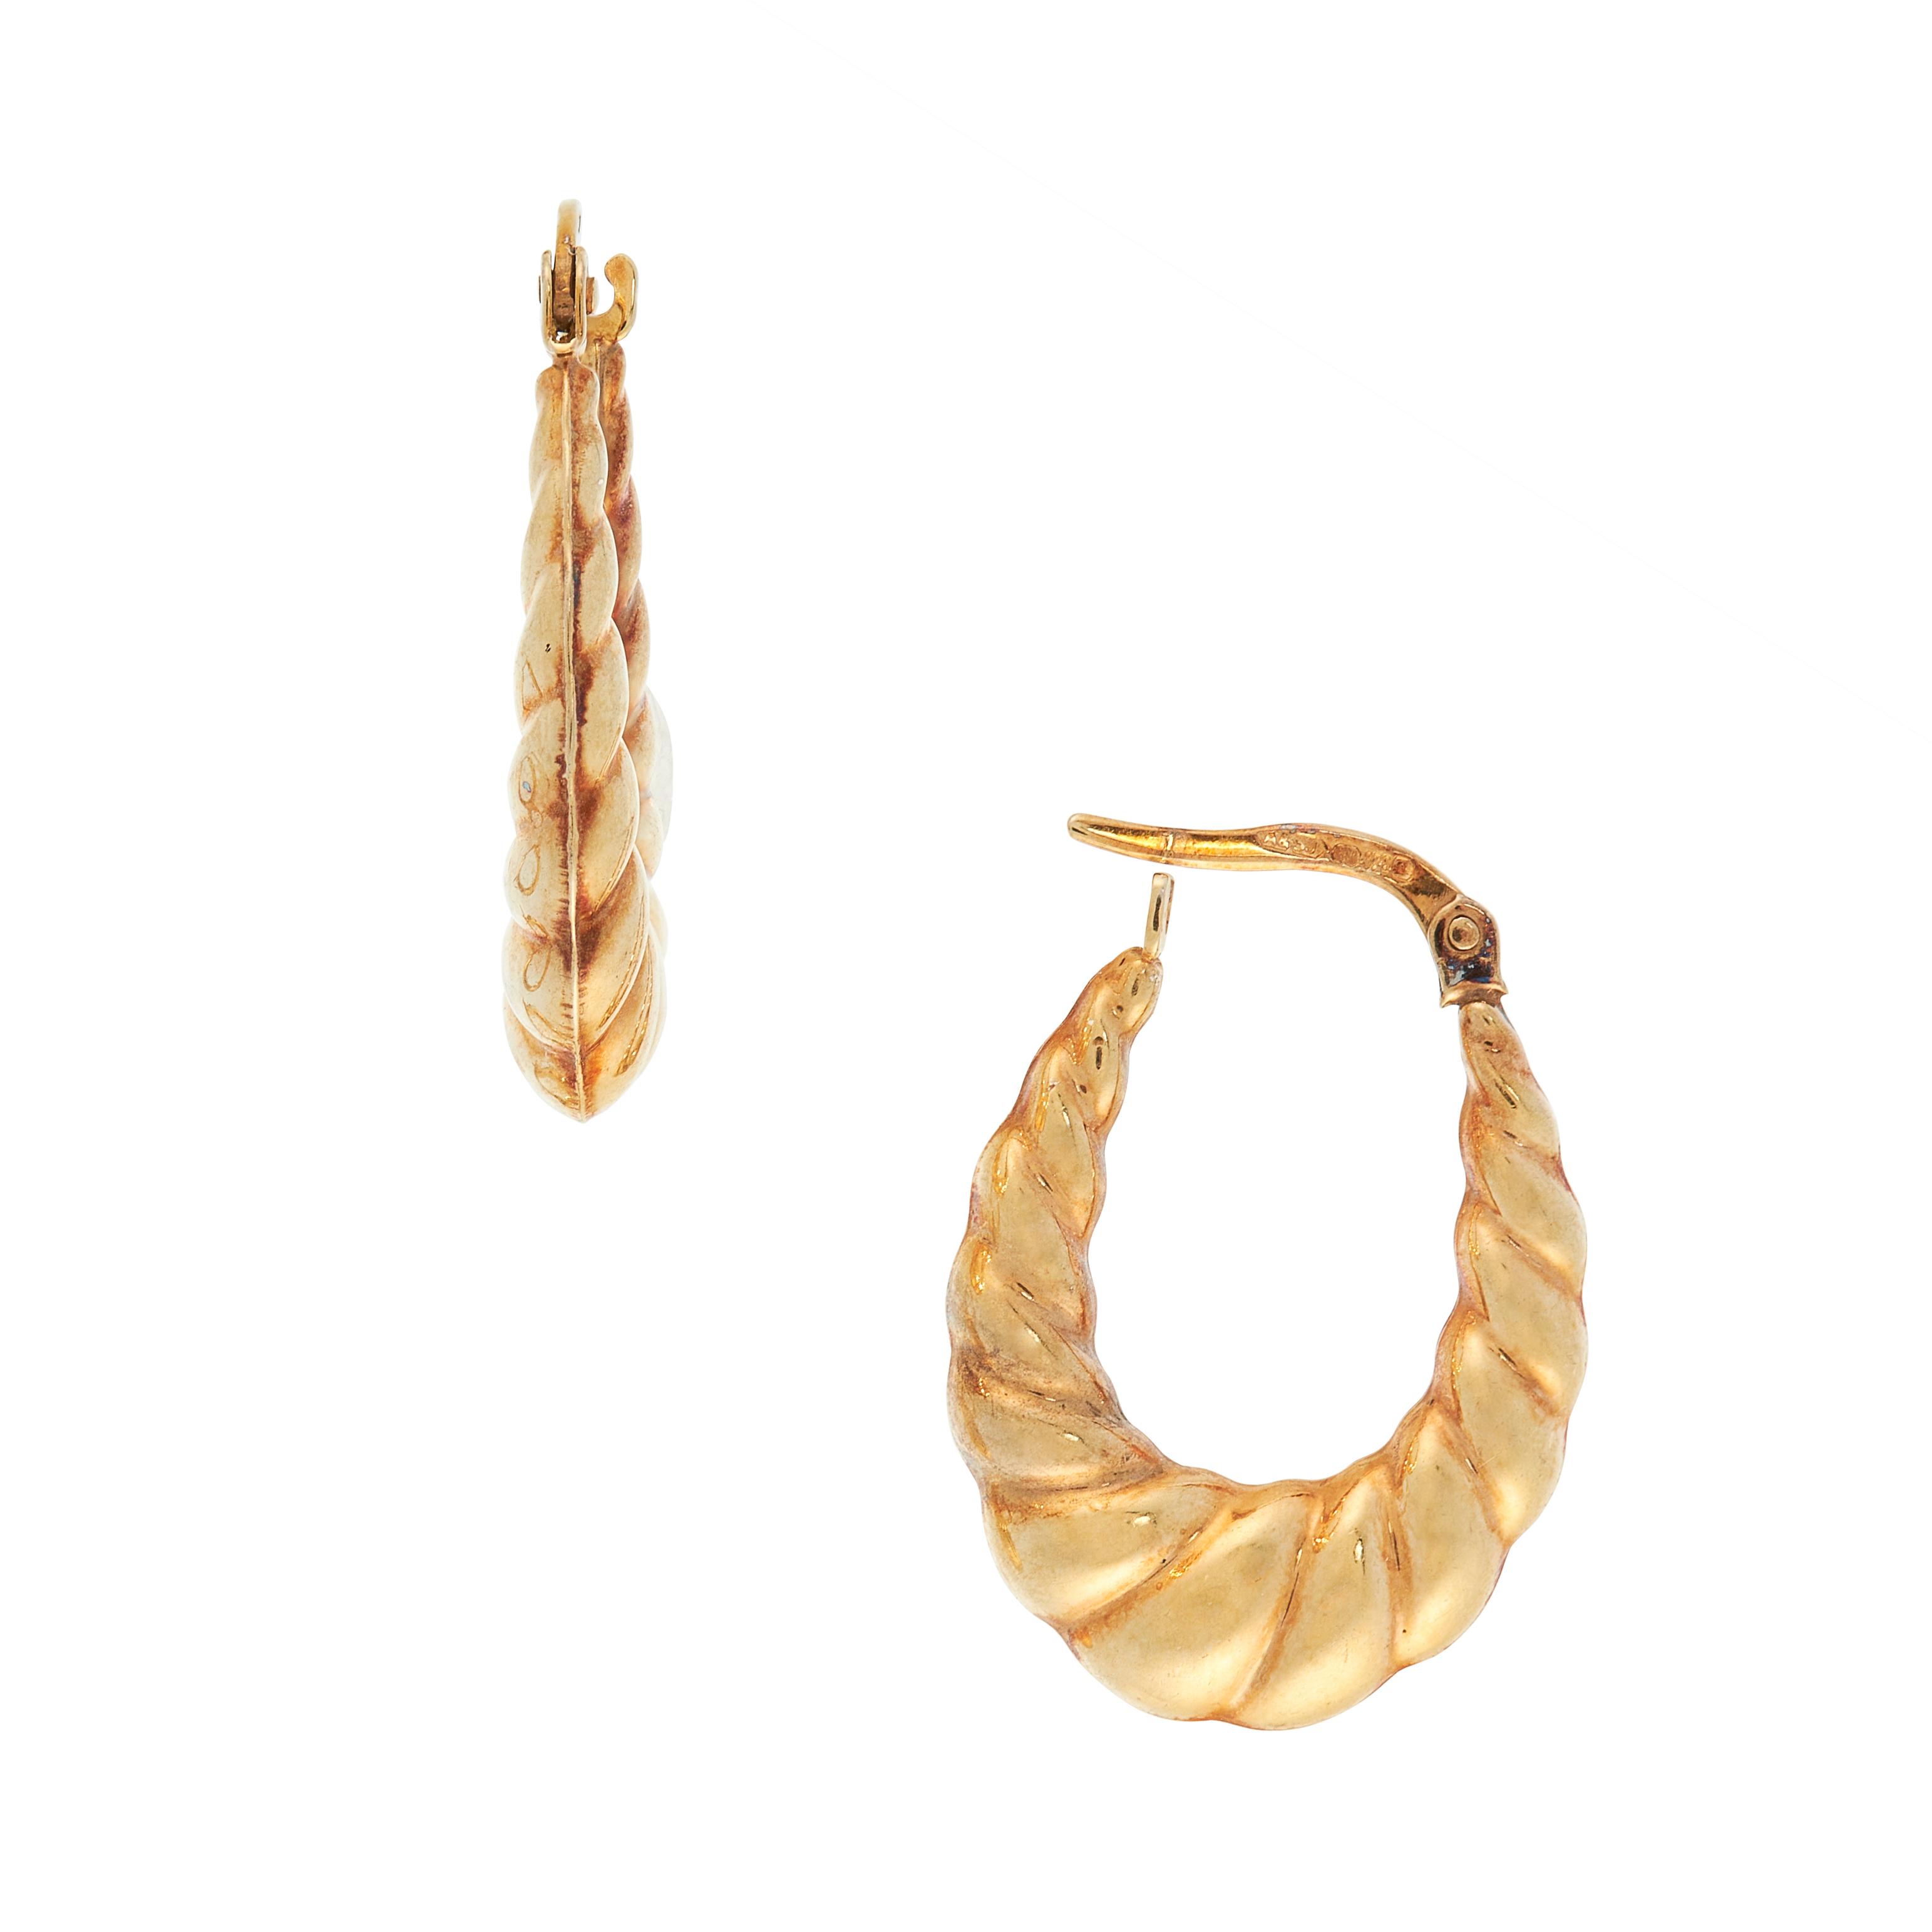 A PAIR OF VINTAGE HOOP EARRINGS in 9ct yellow gold, each designed as an elongated hoop of twisted